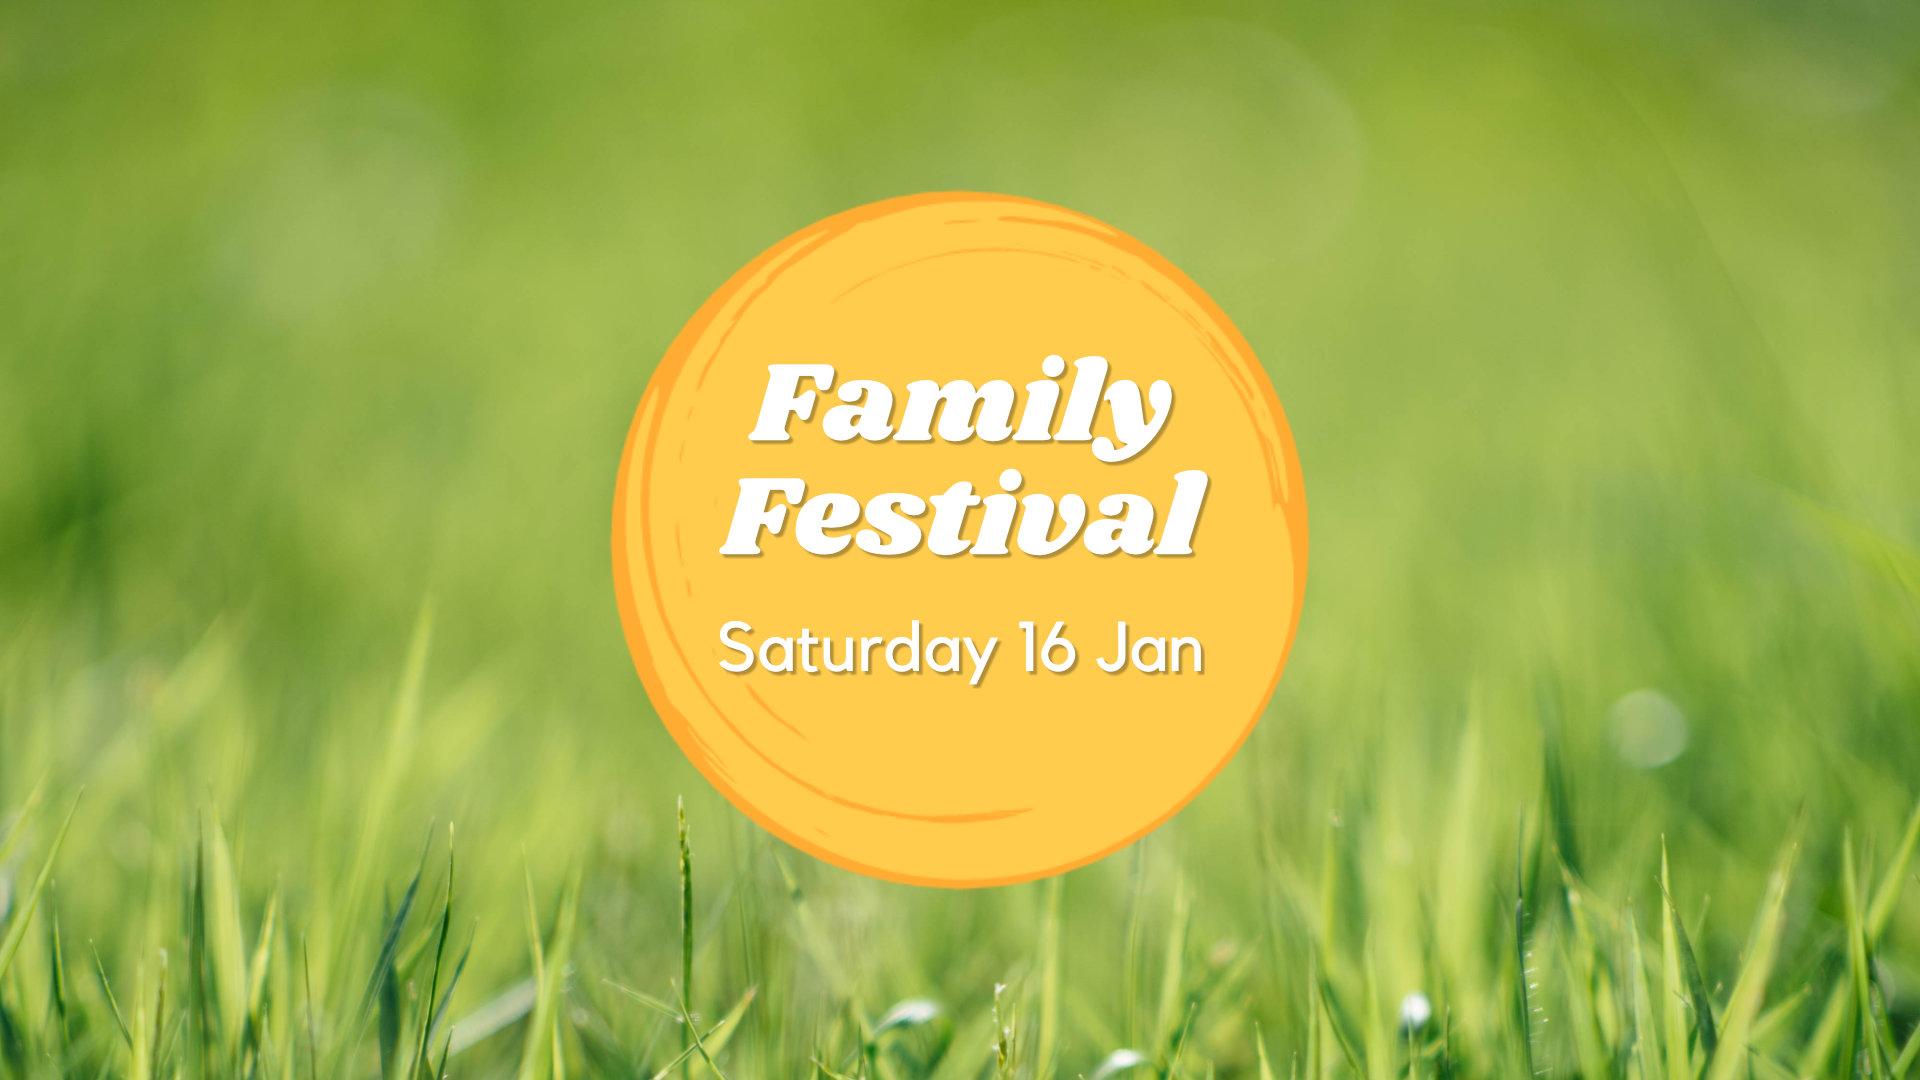 Family Festival Saturday 16 Jan